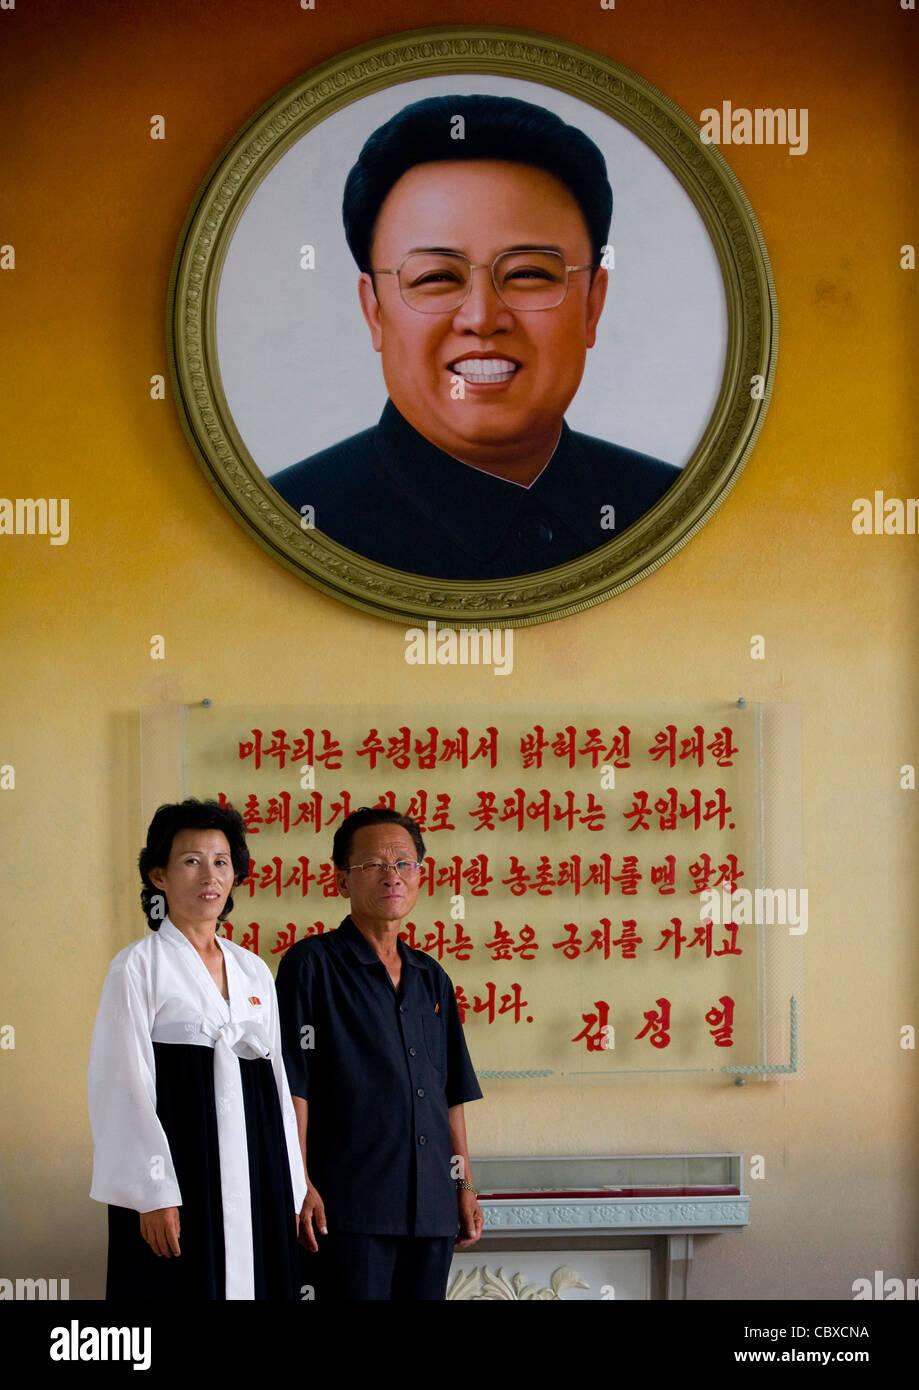 KIM JONG IL AT MUSEUM, NORTH KOREA - Stock Image